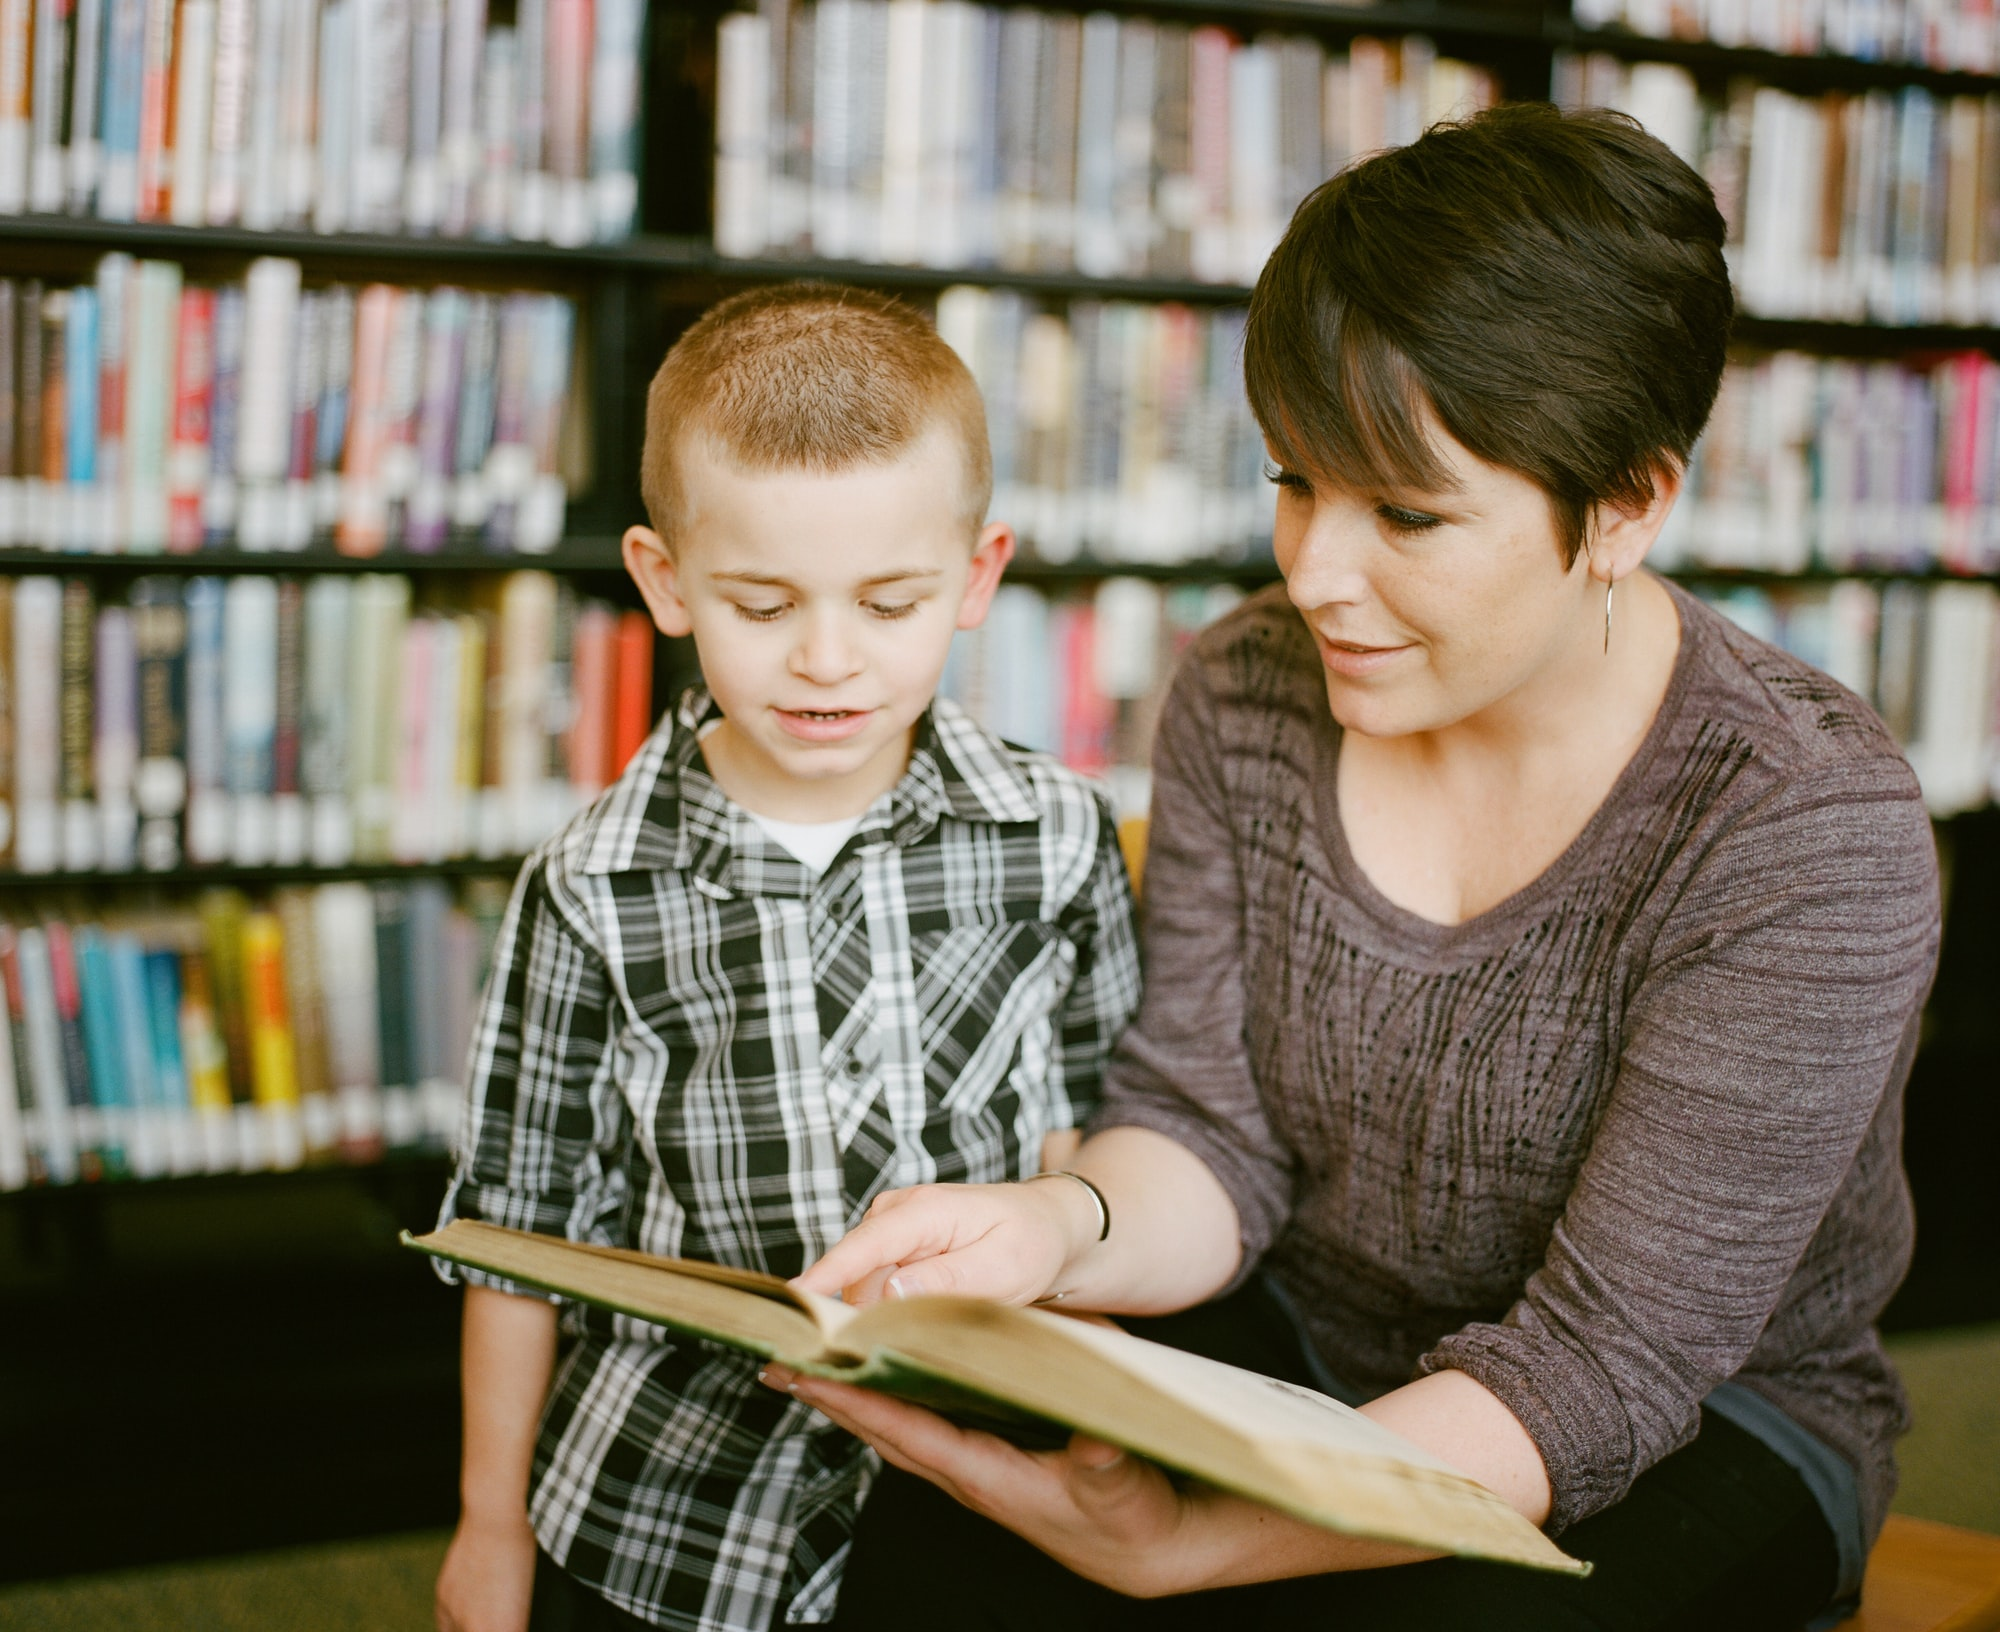 Finding an After-School Babysitter